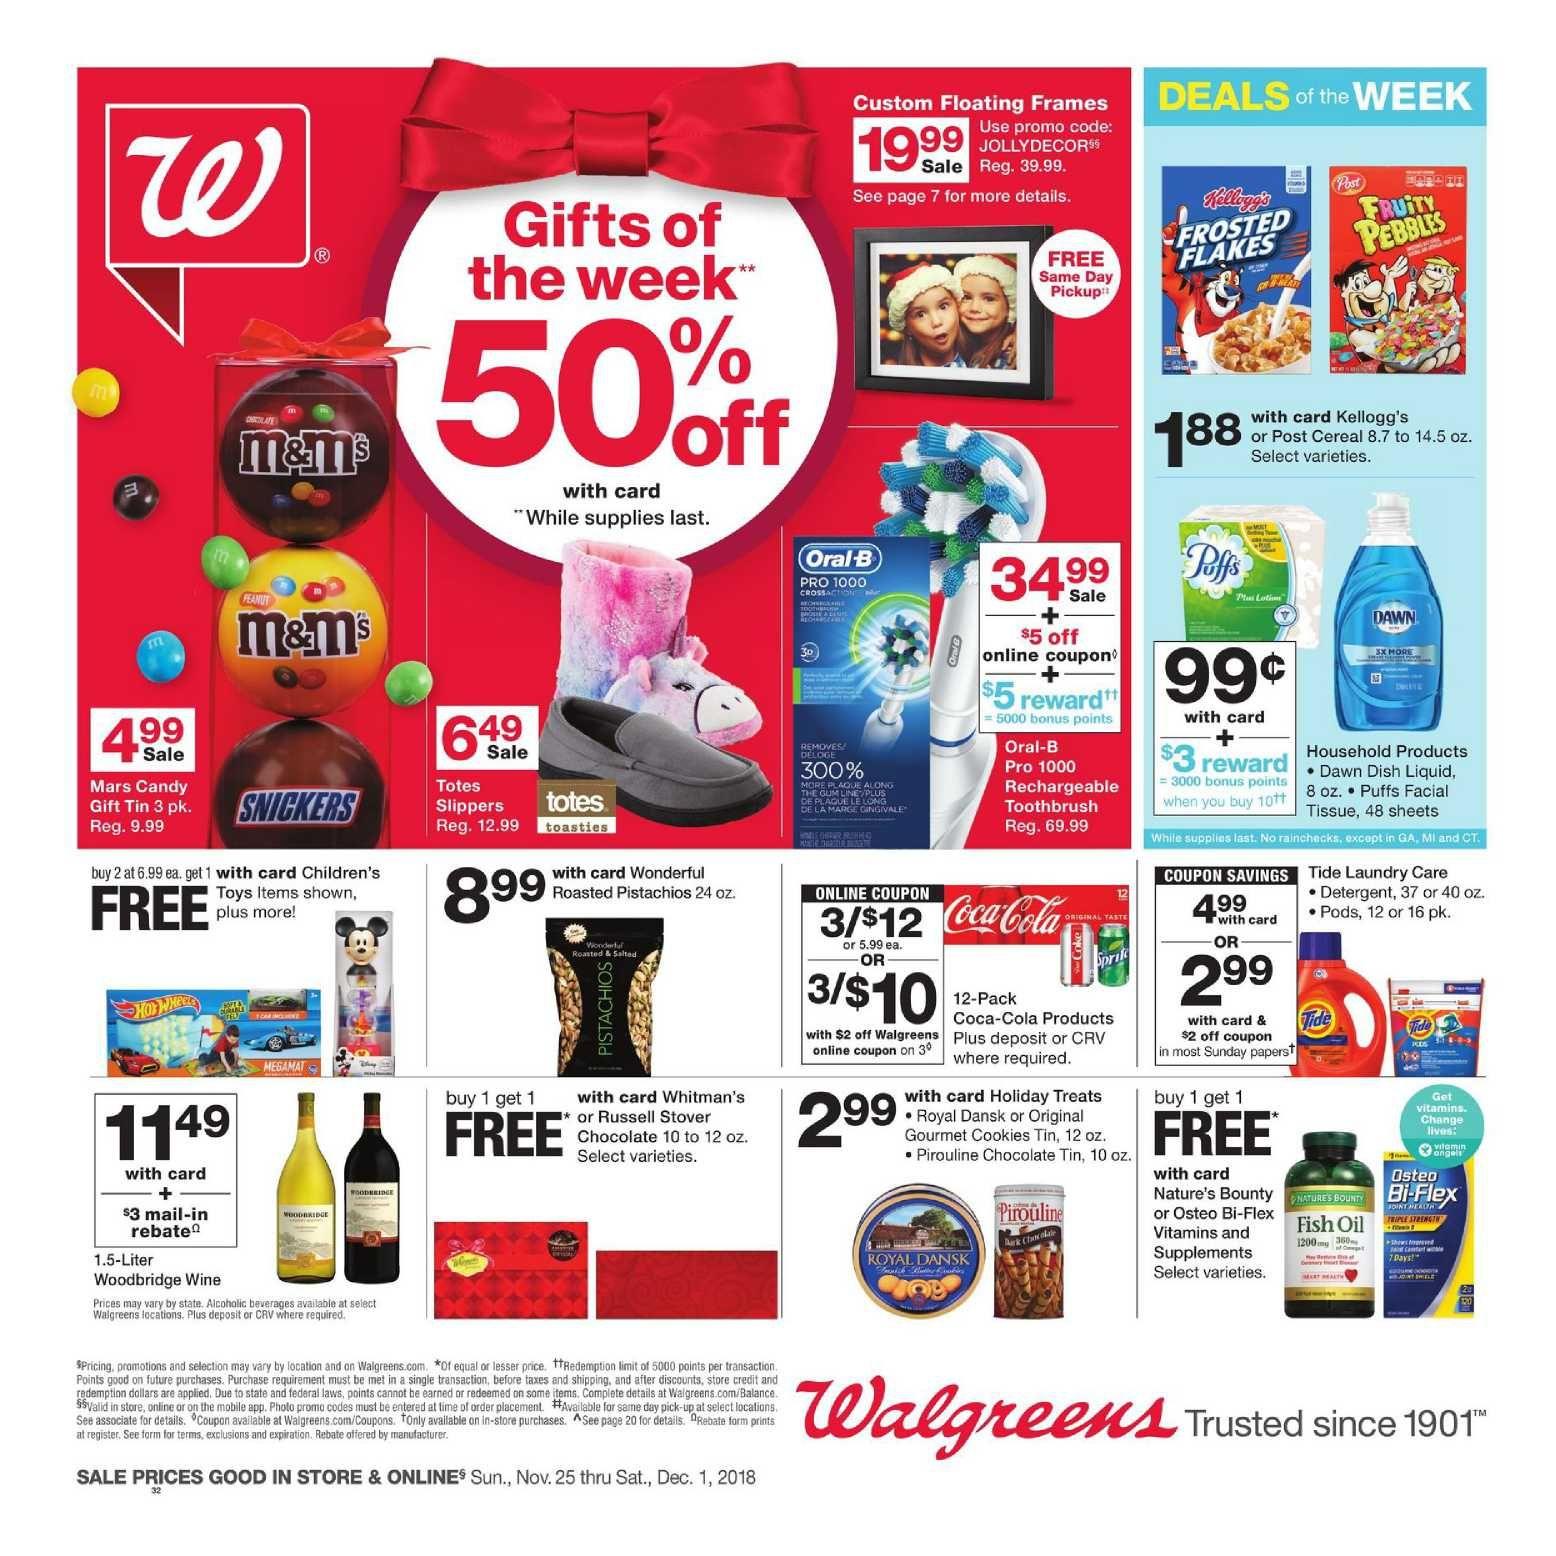 Walgreens Weekly Ad Jan 31 Feb 6 2021 Walgreens Sneak Peek Preview Weeklyad123 Com Weekly Ad Circular Grocery Stores Weekly Ads Walgreens Digital Coupons